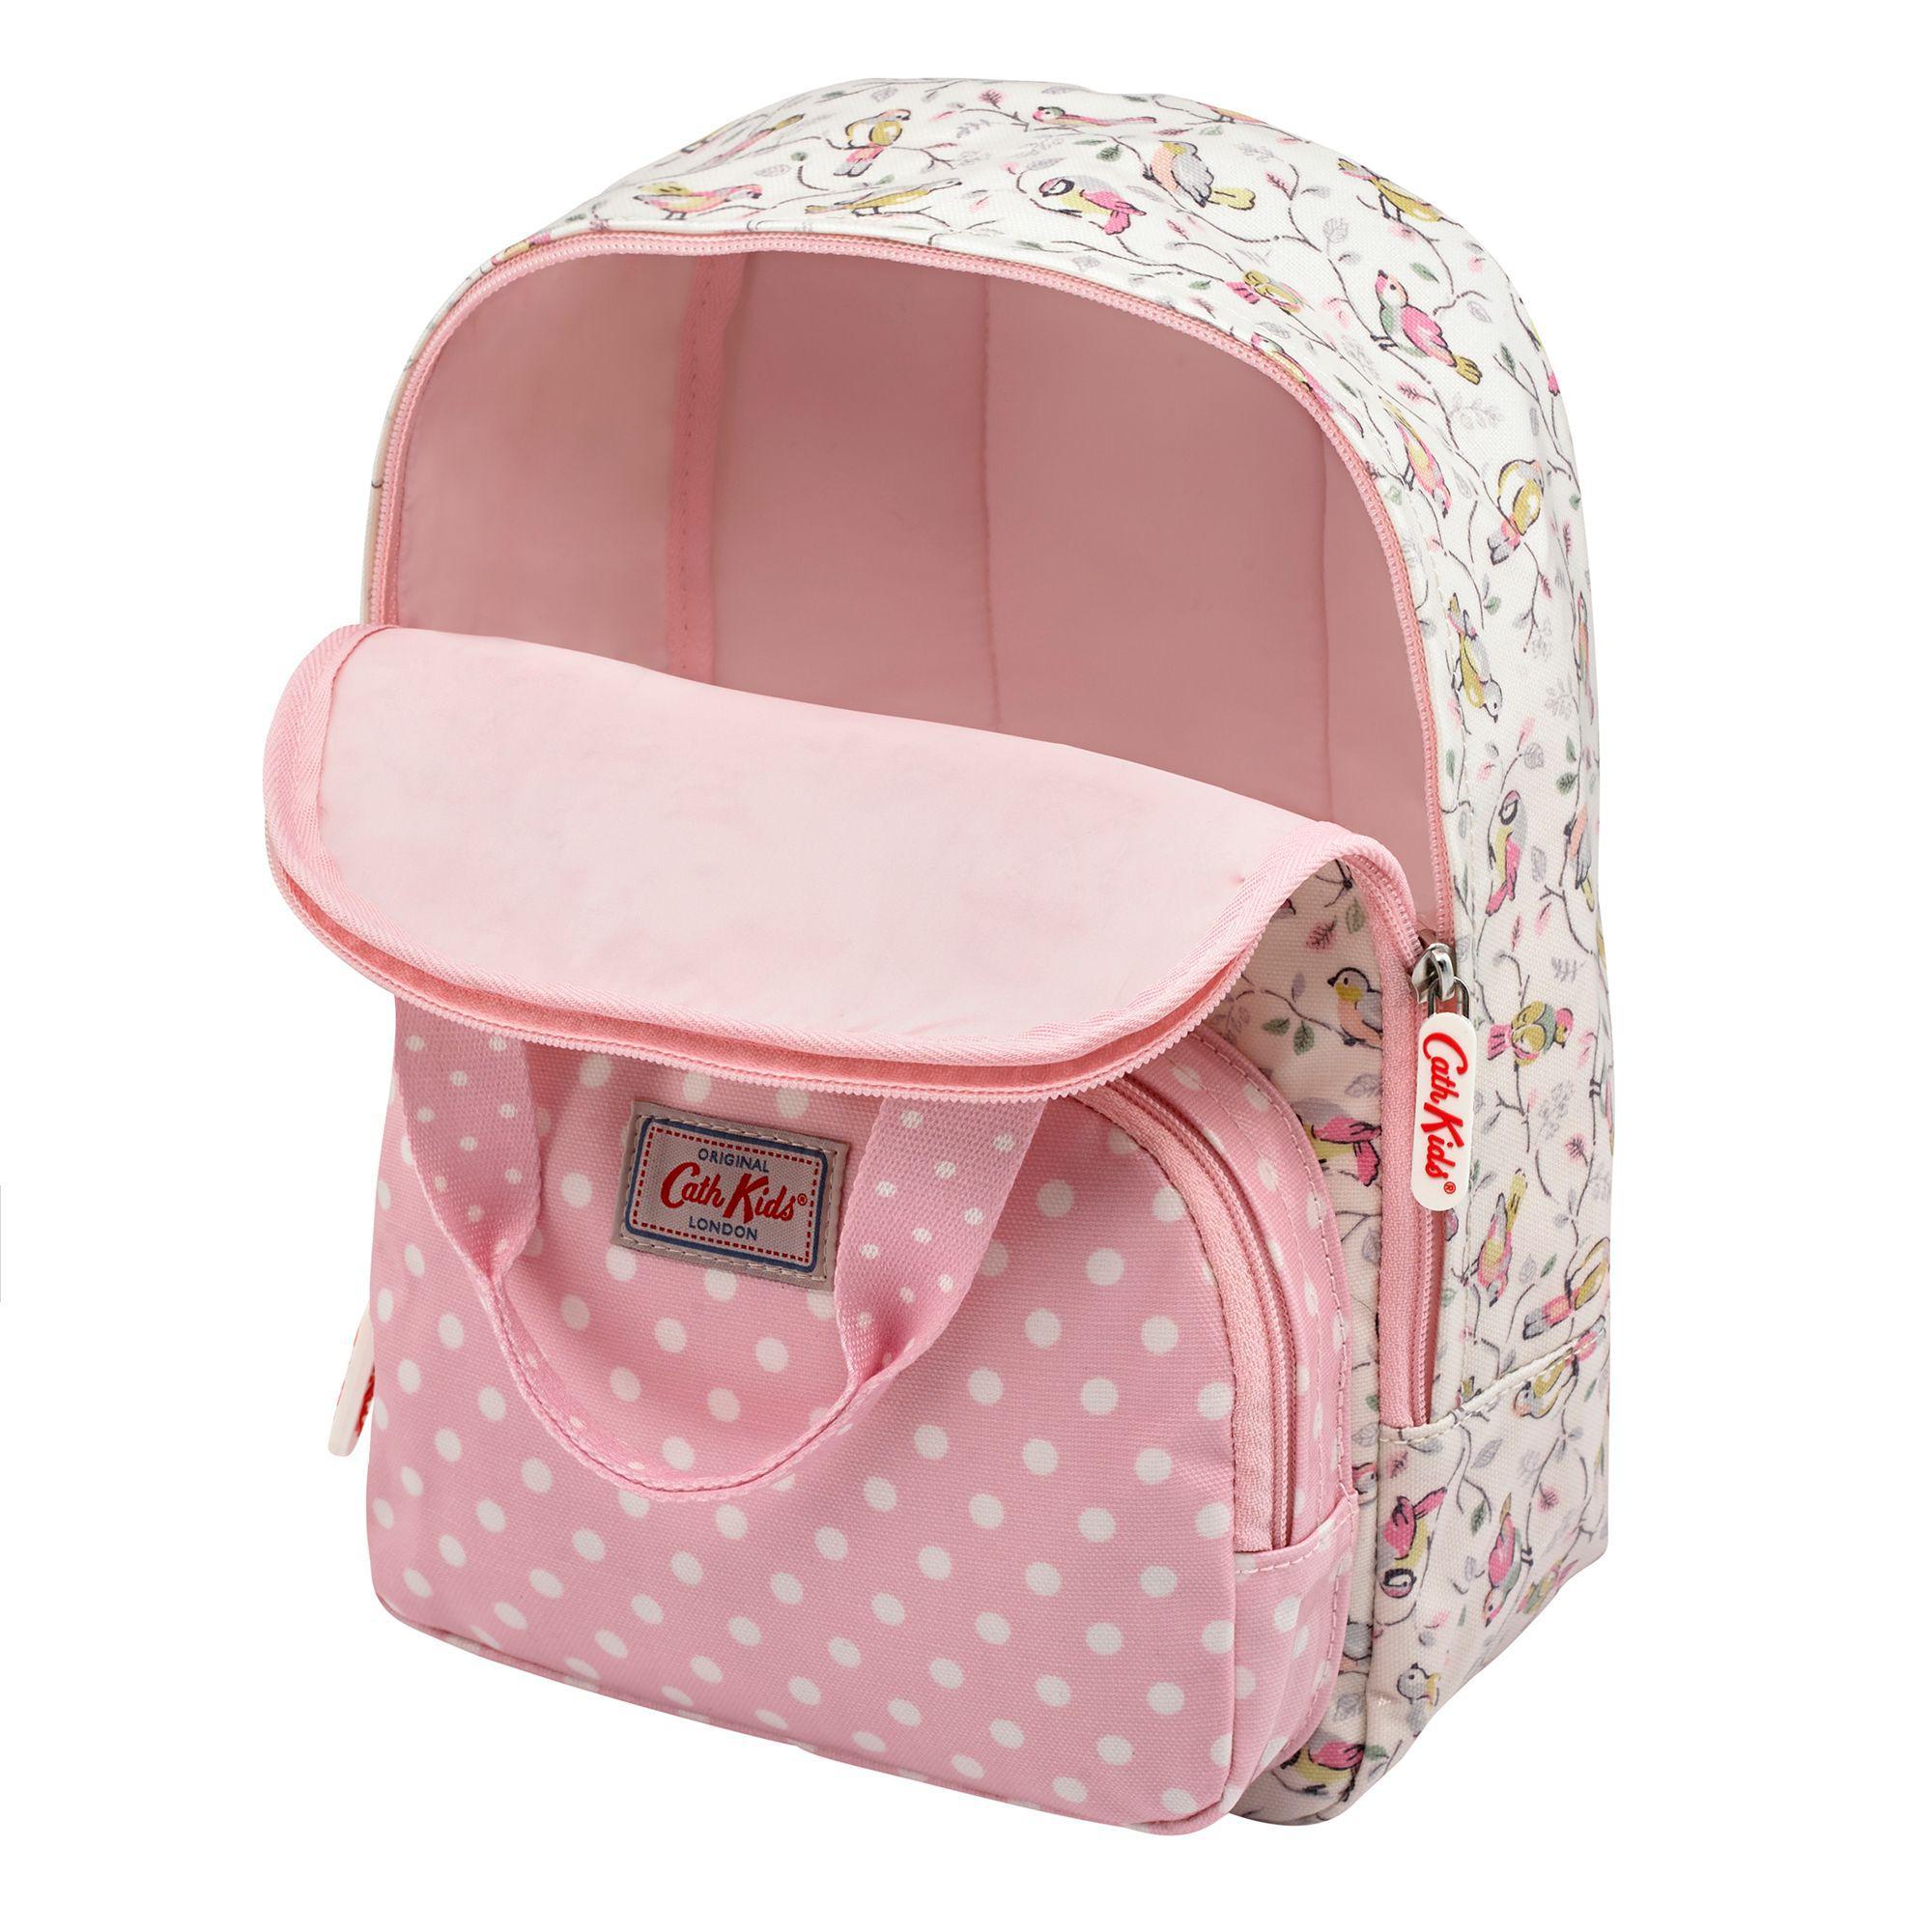 17fc64288b2c Cath Kidston Cath Kids Children s Little Birds Medium Backpack in ...